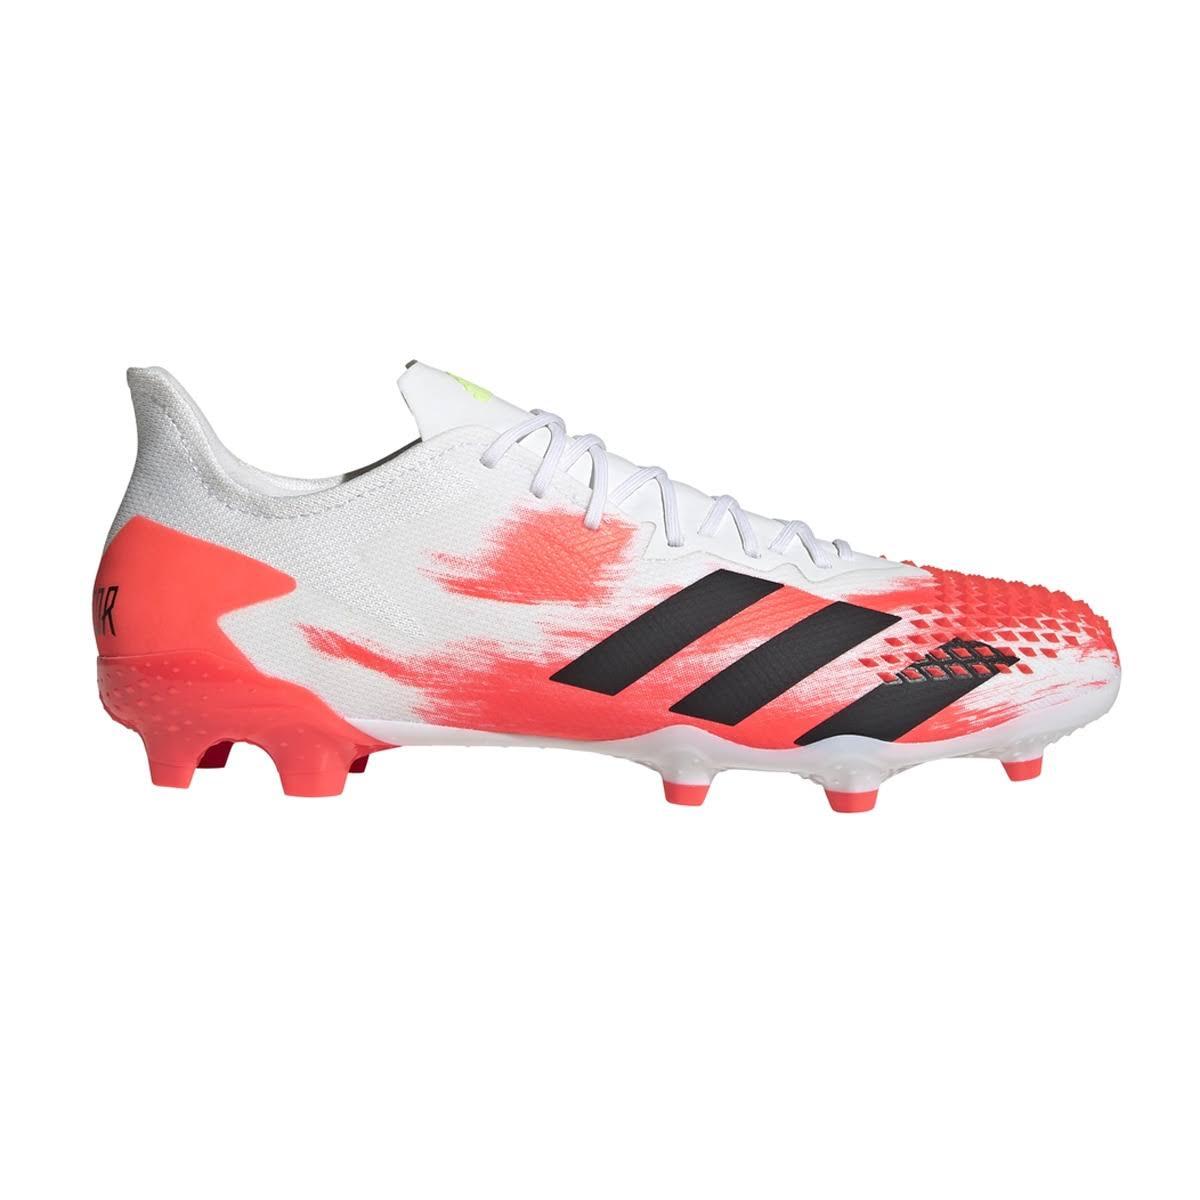 Adidas Predator 20.2 Firm Ground Boots Football - White